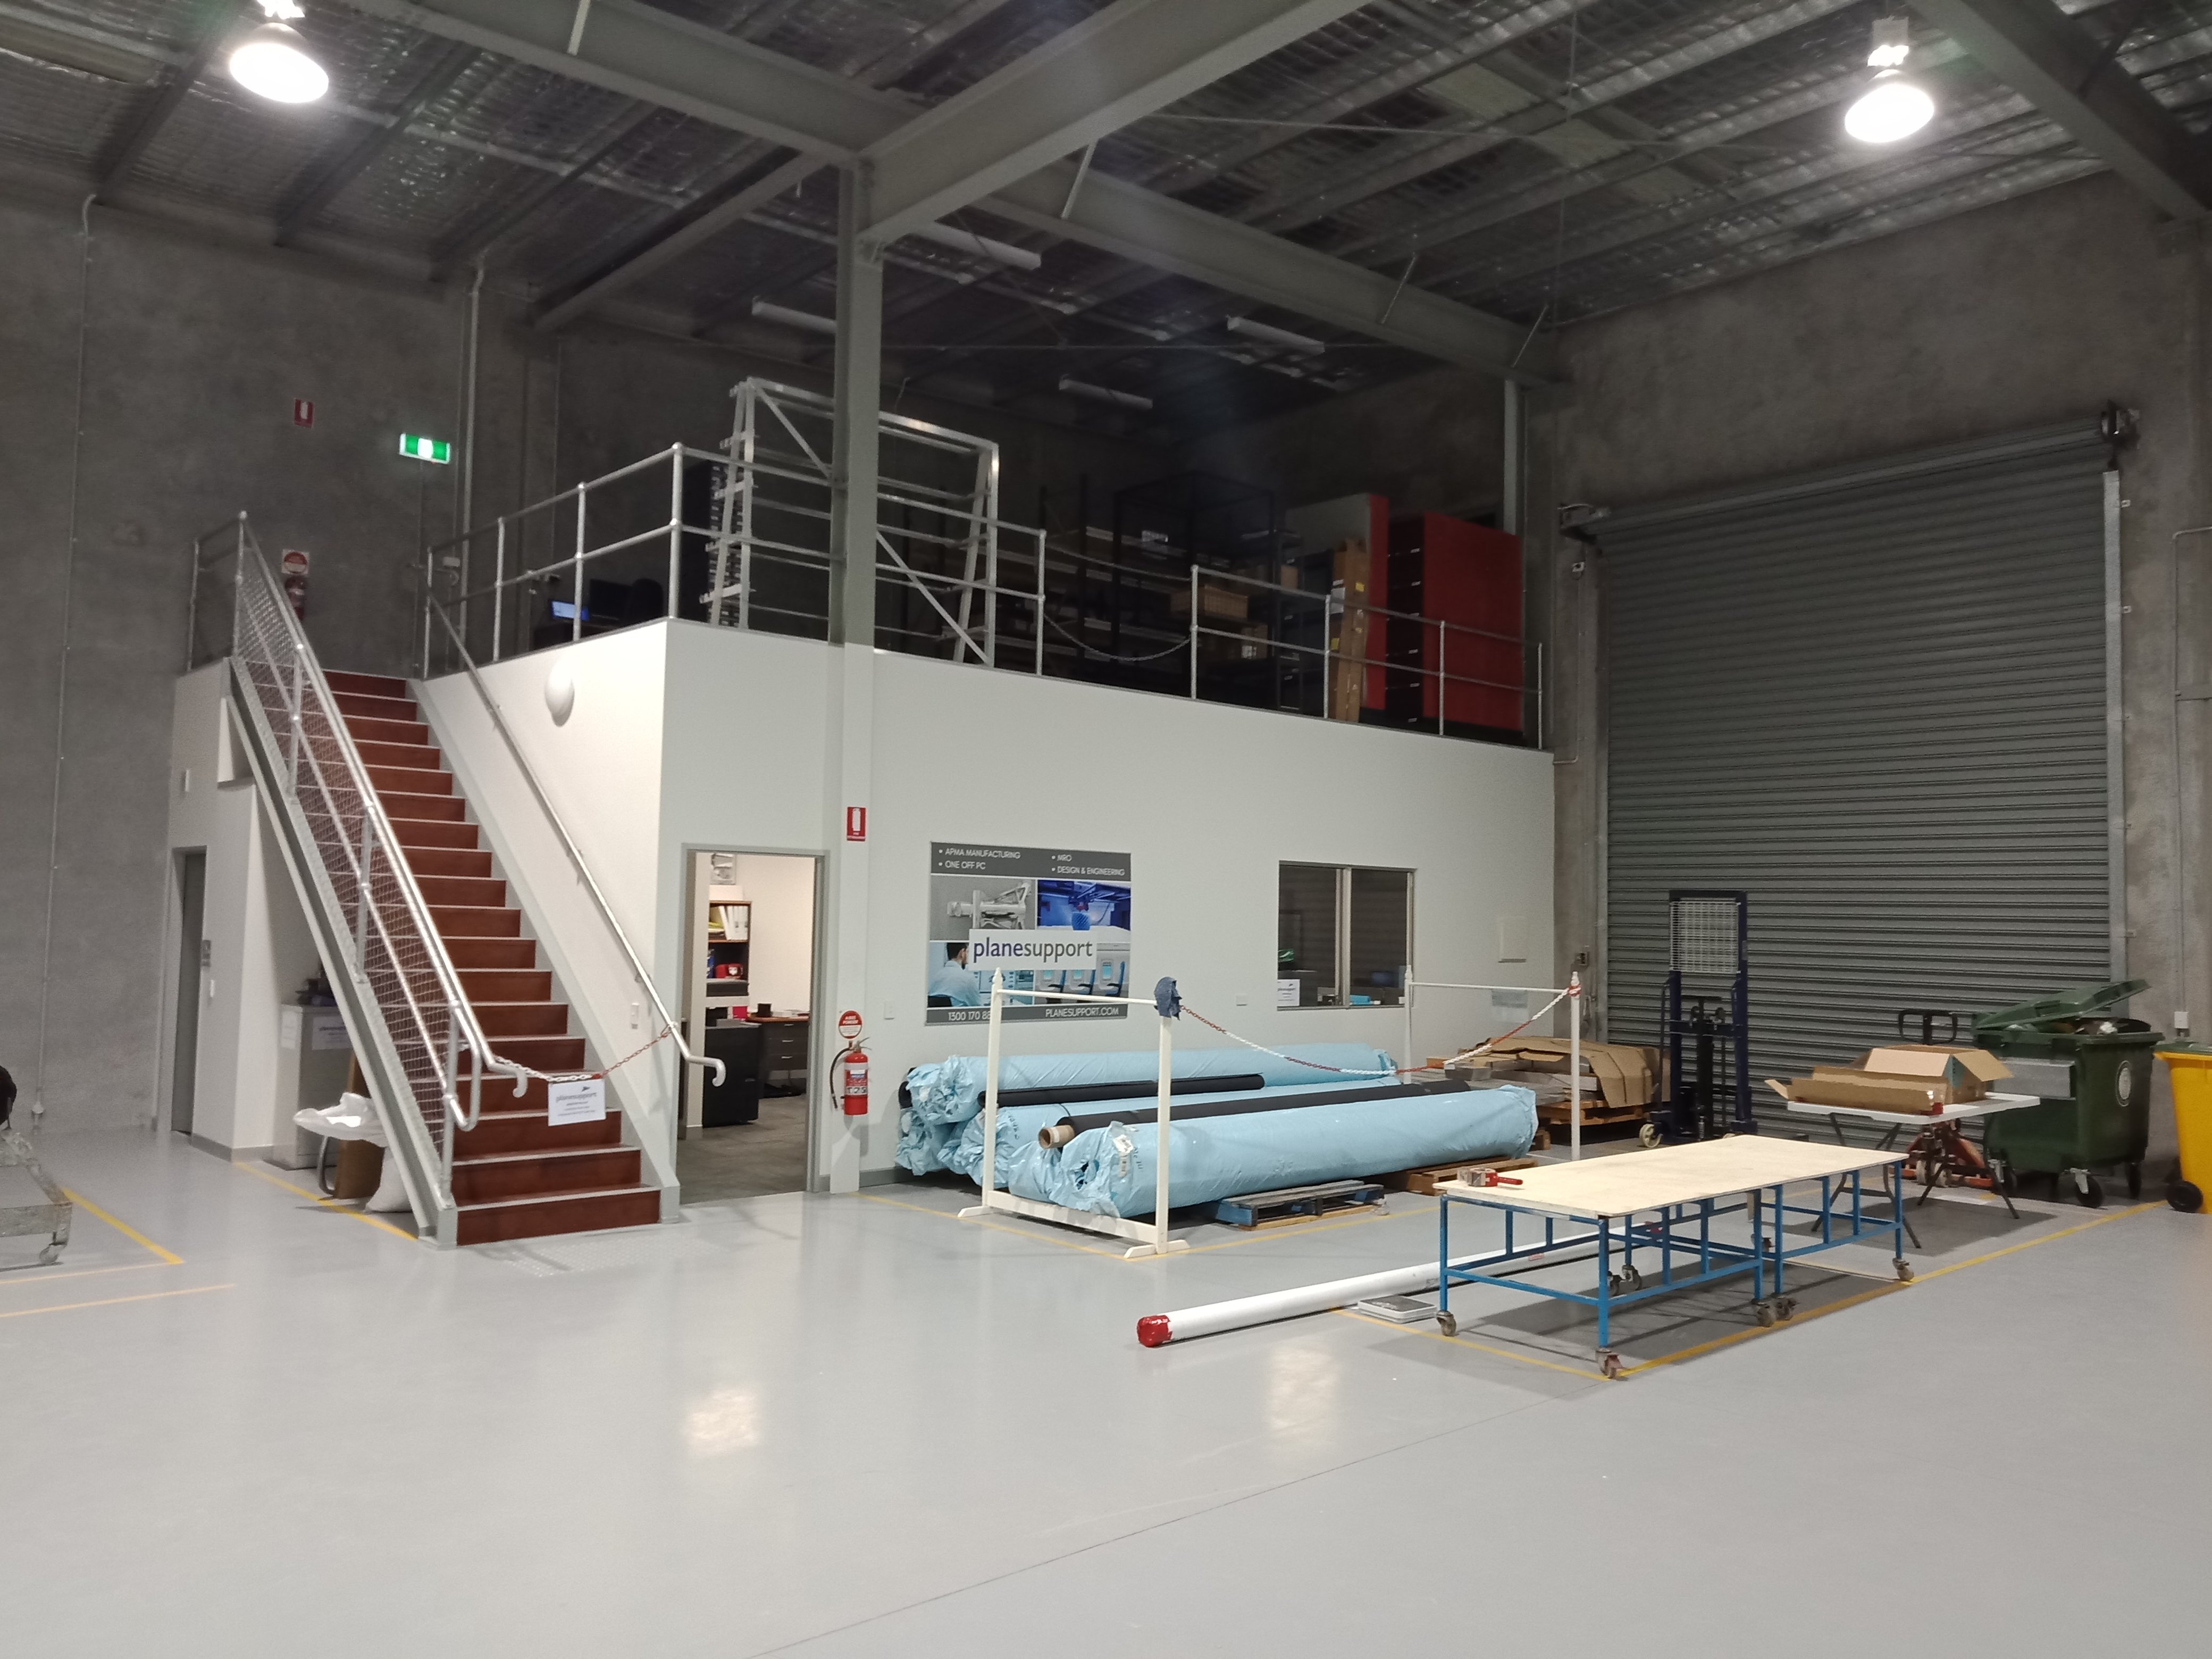 Plane Support carpet manufacturing